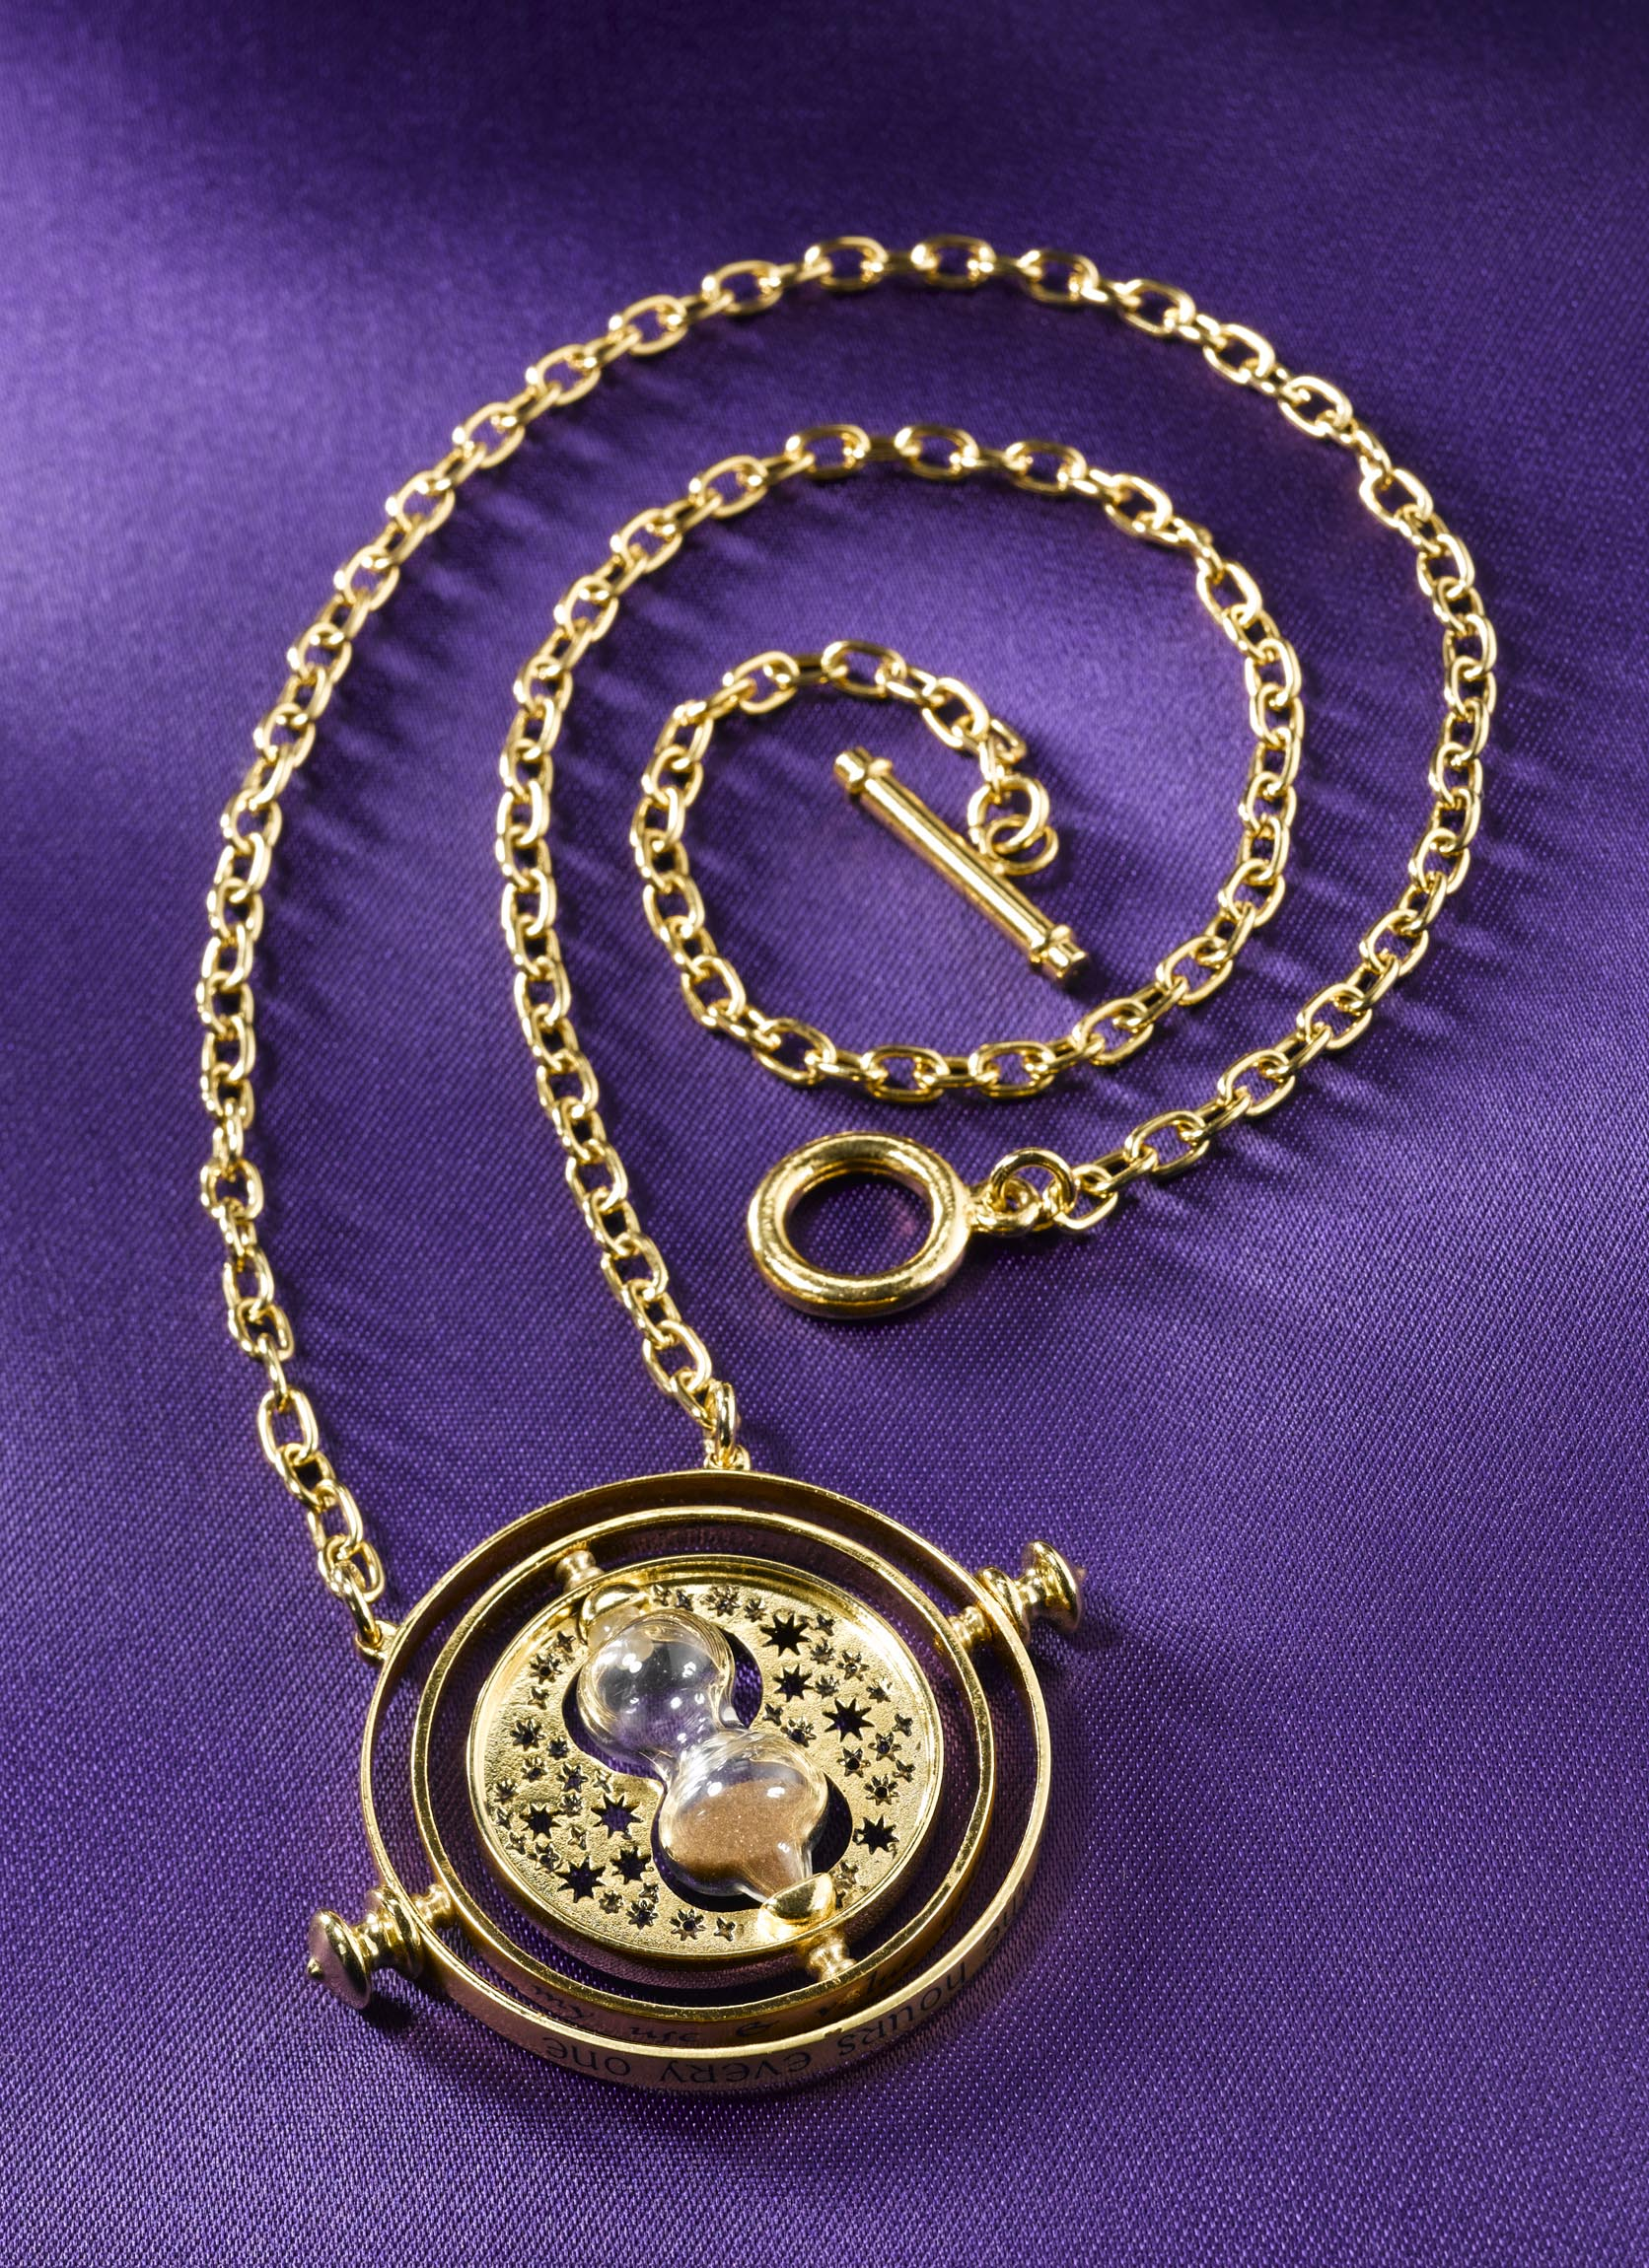 Harry Potter Time Turner - Hermione Time Turner Necklace